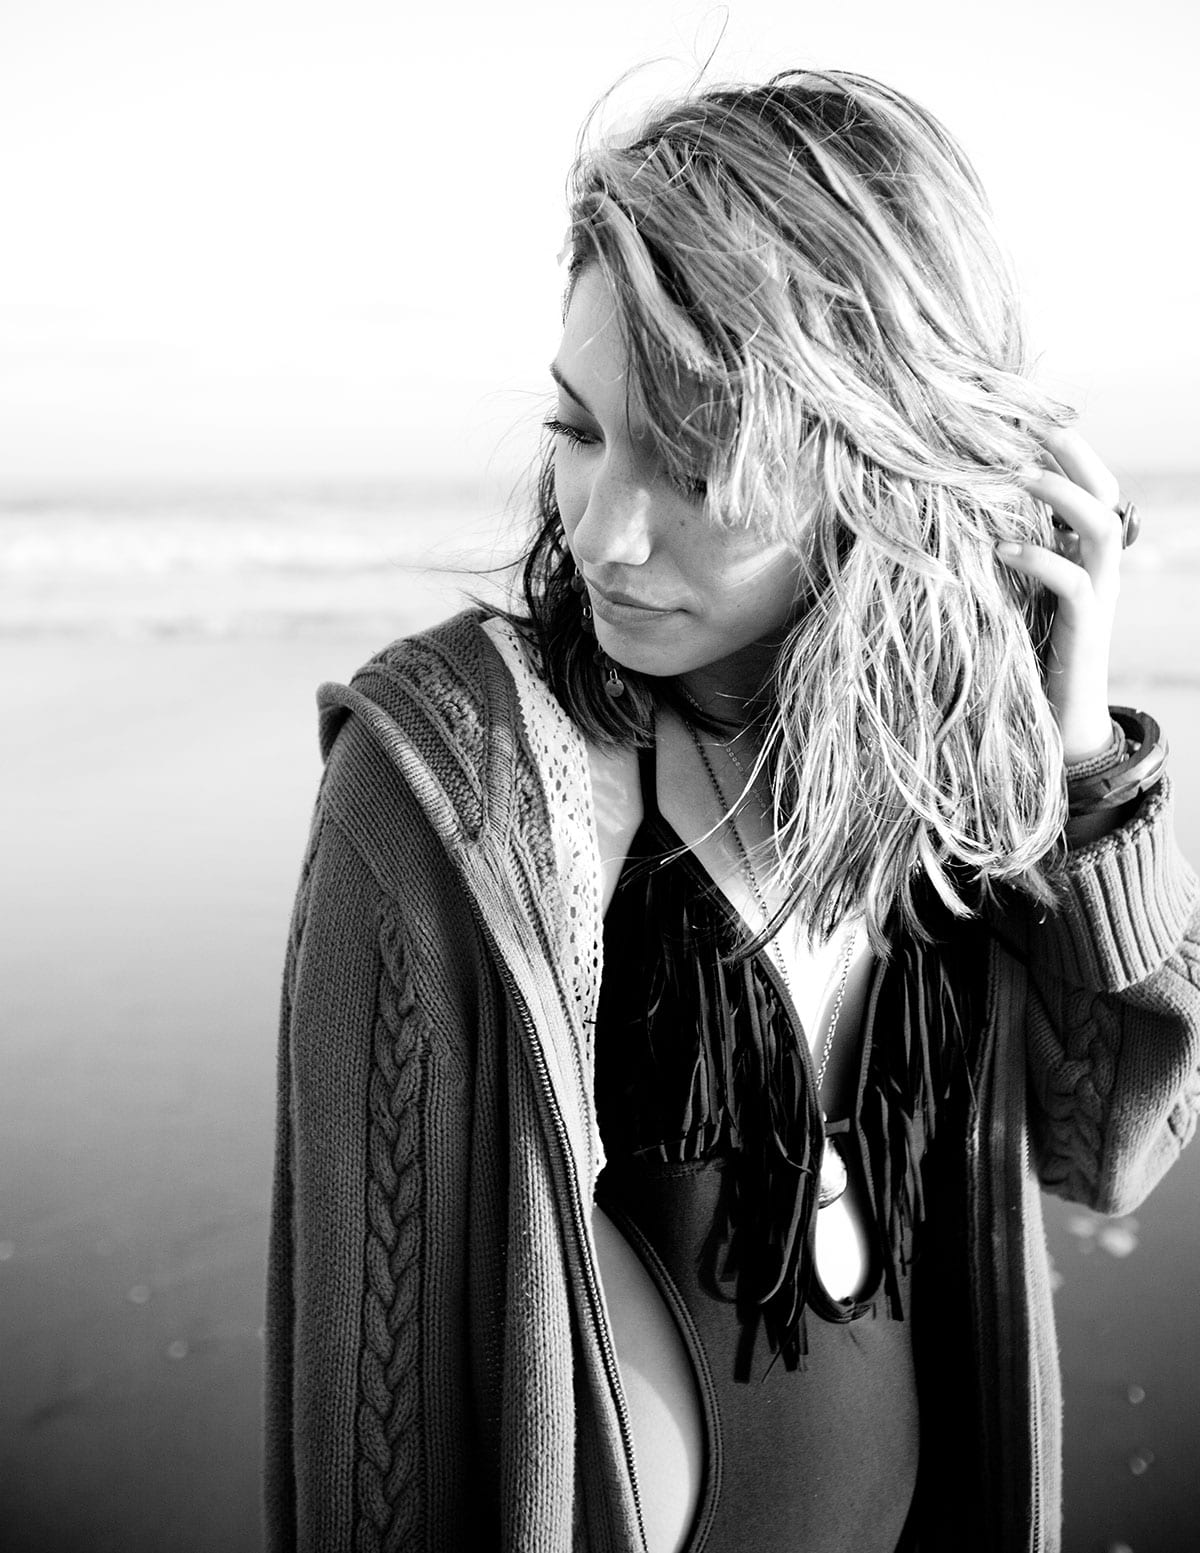 lIFESTYLE PHOTOGRAPHER goodbye-summer-beach-vibes-1017